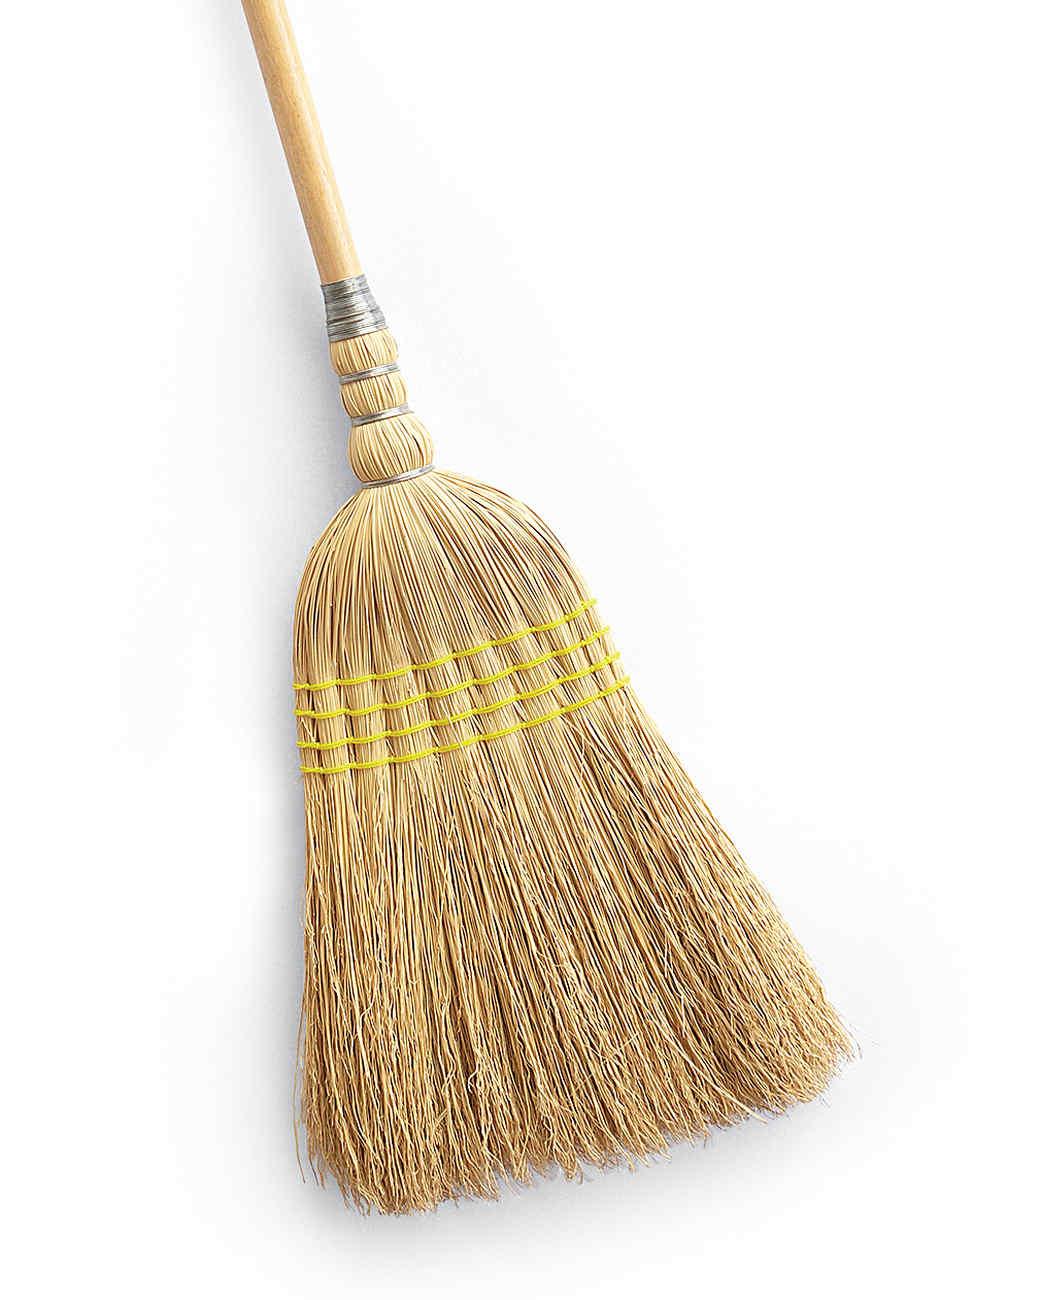 mld104674_1009_broom1.jpg